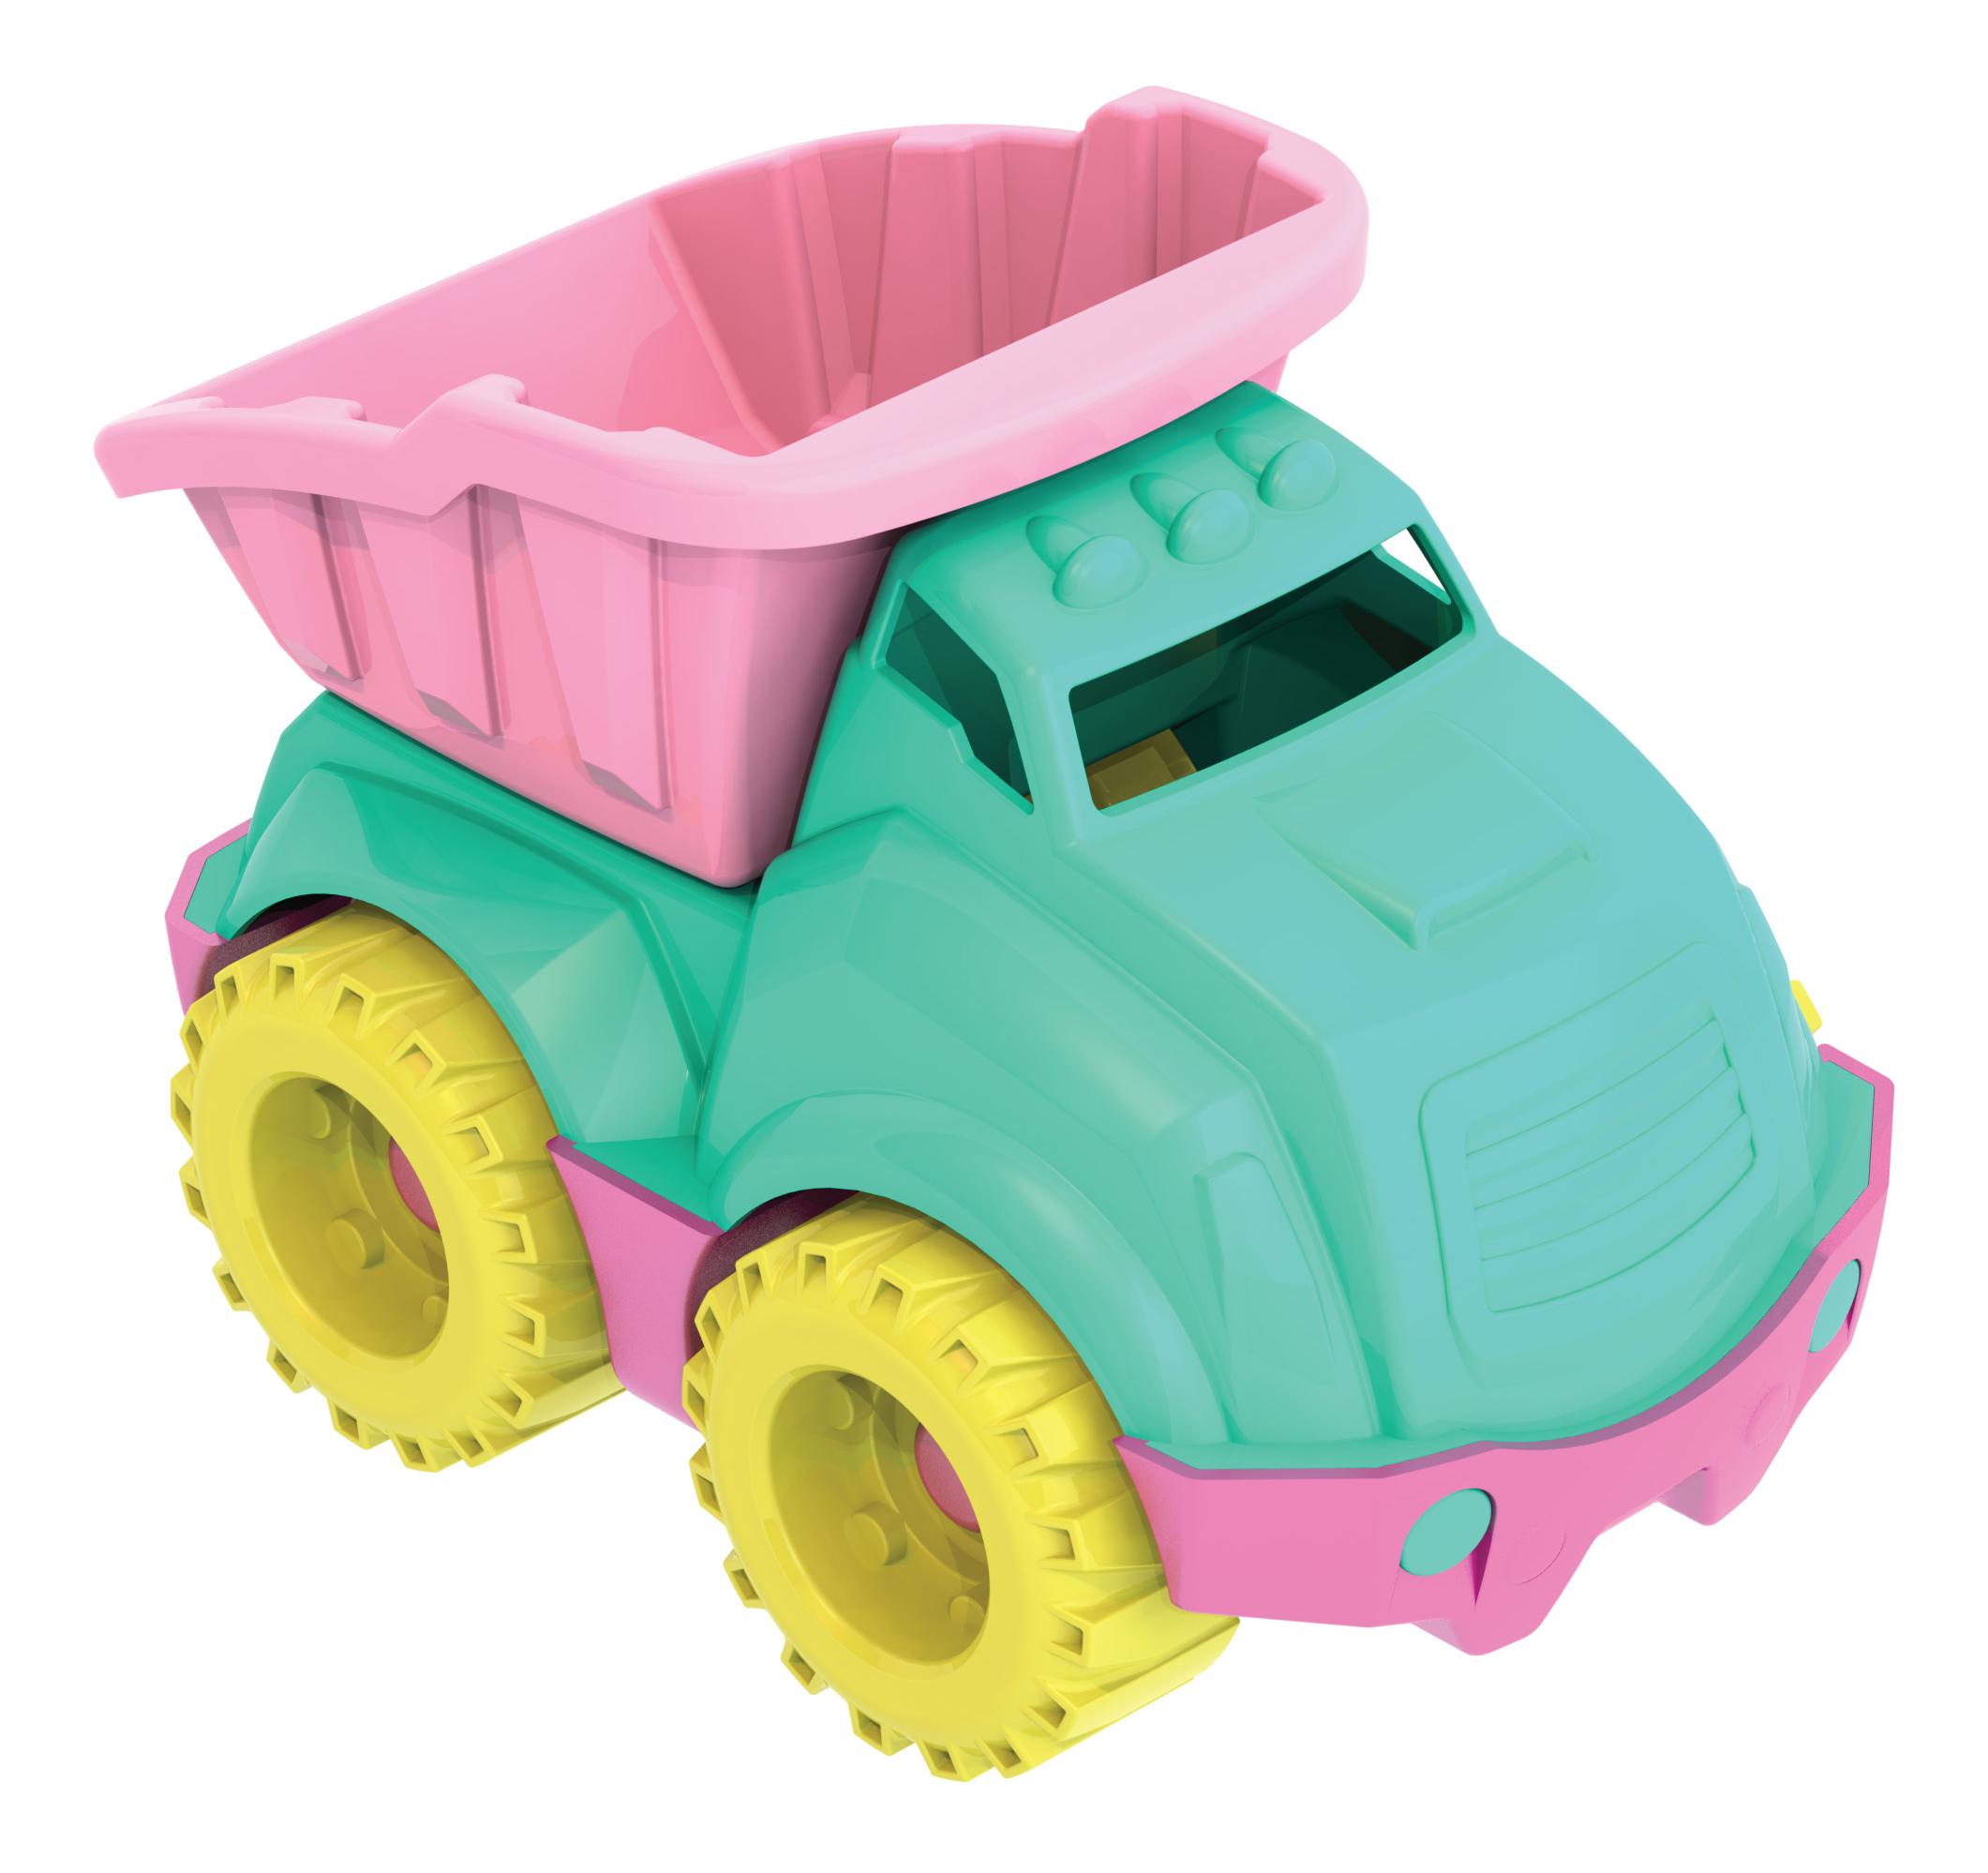 Купить Грузовик мал, , Маленький грузовик Нордпласт, НОРДПЛАСТ, Строительная техника